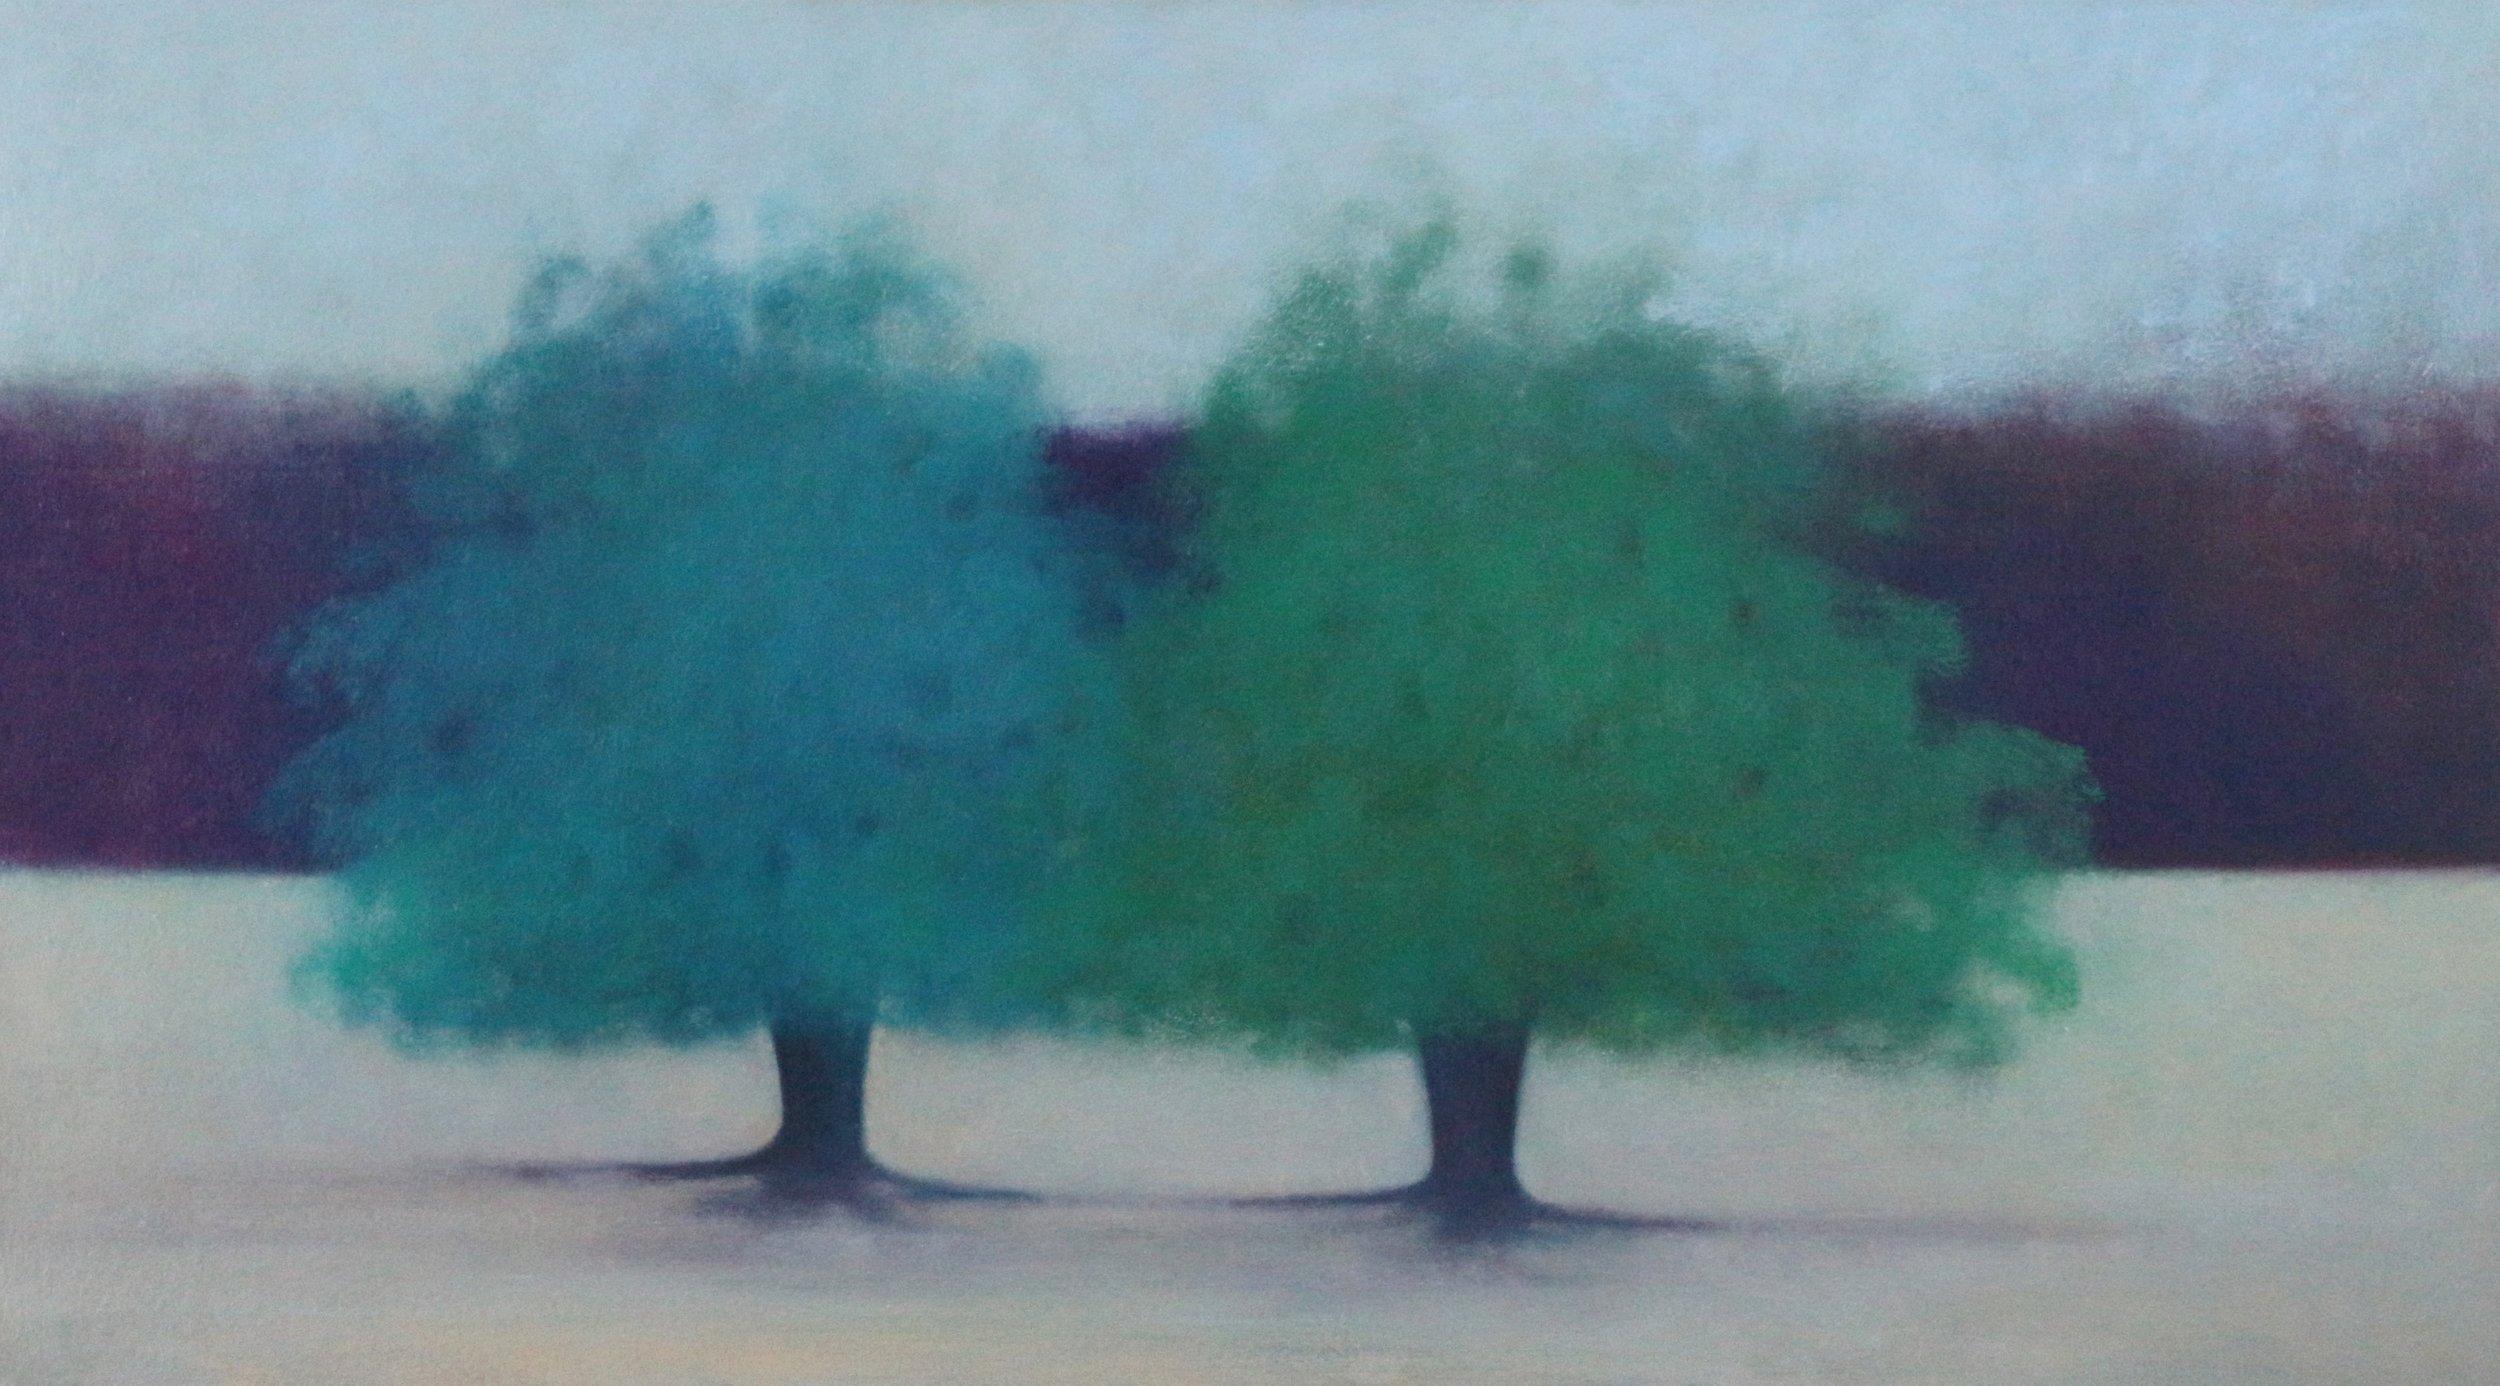 Title: Merged  Size: 76 x 138 cm  Medium: Oil on canvas  Price: £2800